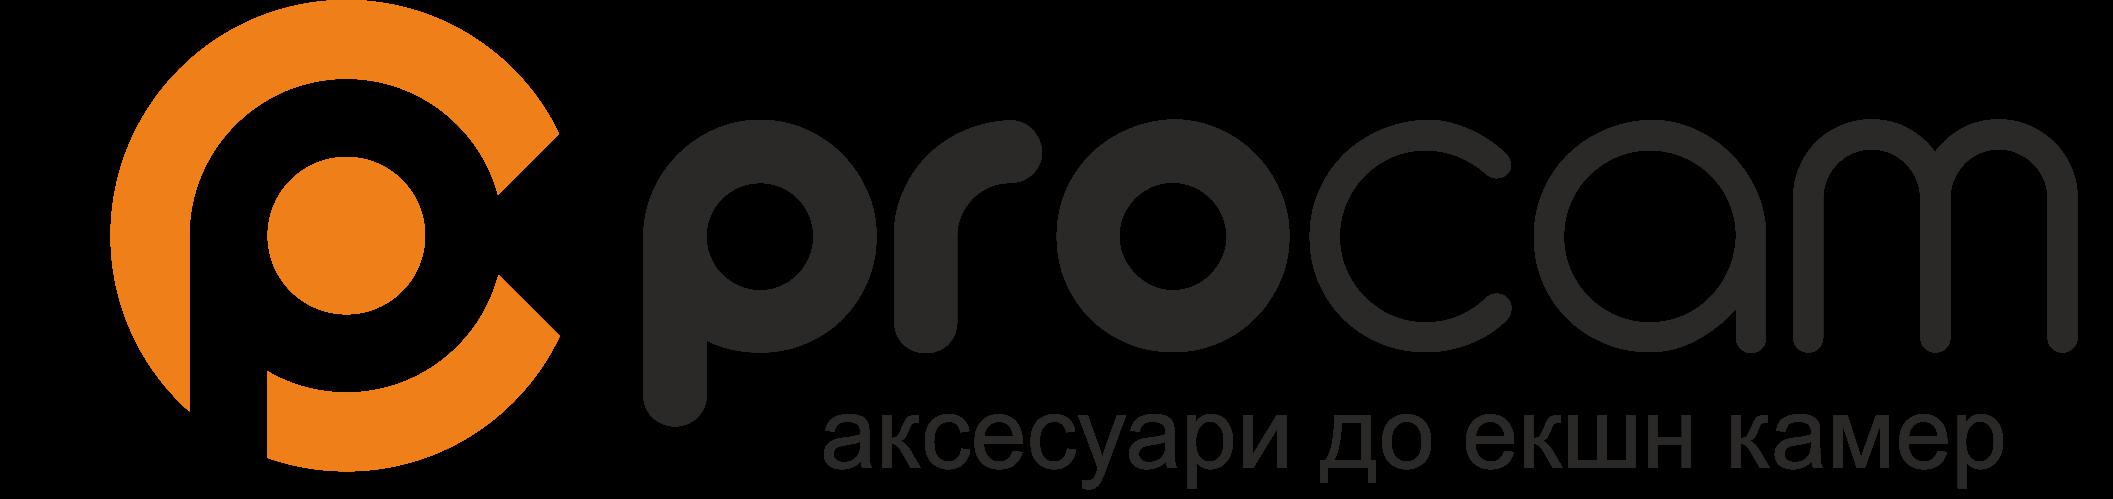 Proсam - Екшн камери і аксессуари